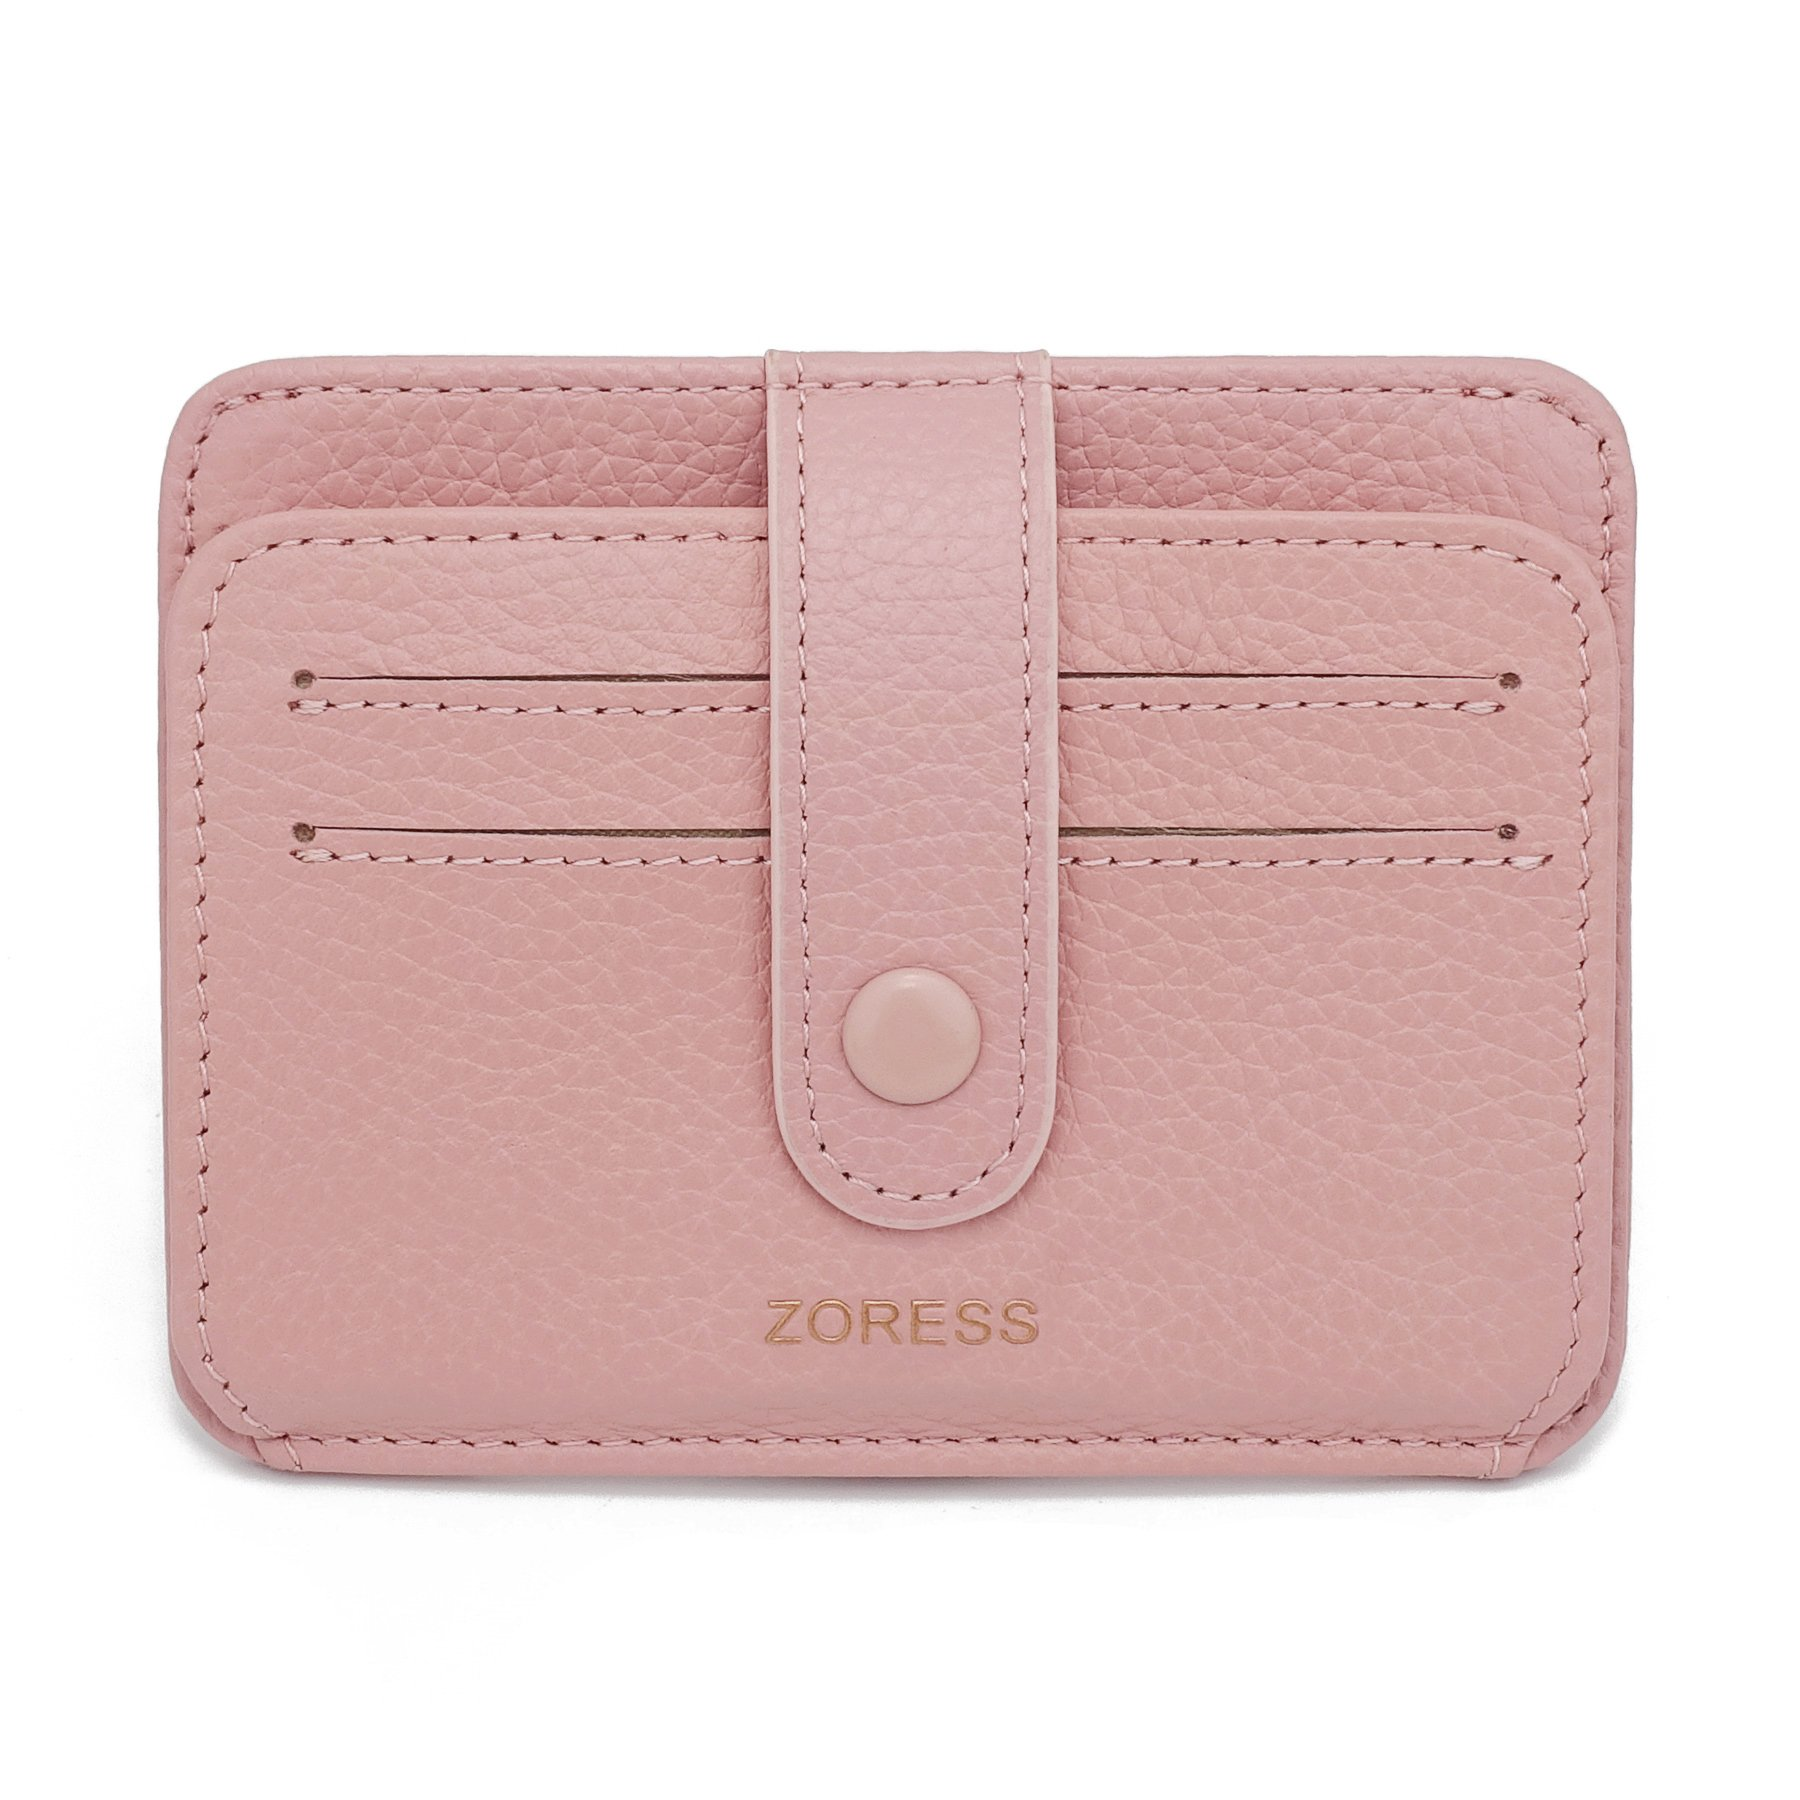 ZORESS Womens Leather RFID Blocking Slim Credit Card Case Holder Travel Front Pocket Wallet(Pink)